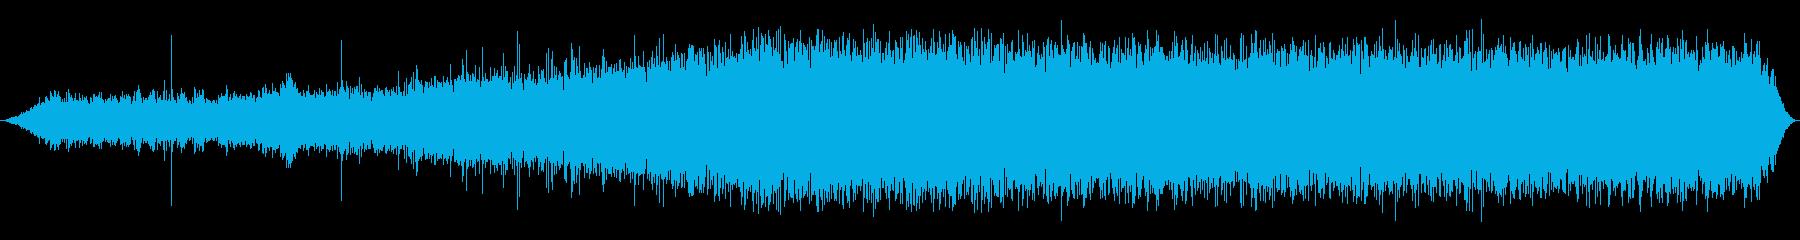 LEARJET 55:INT:離陸...の再生済みの波形